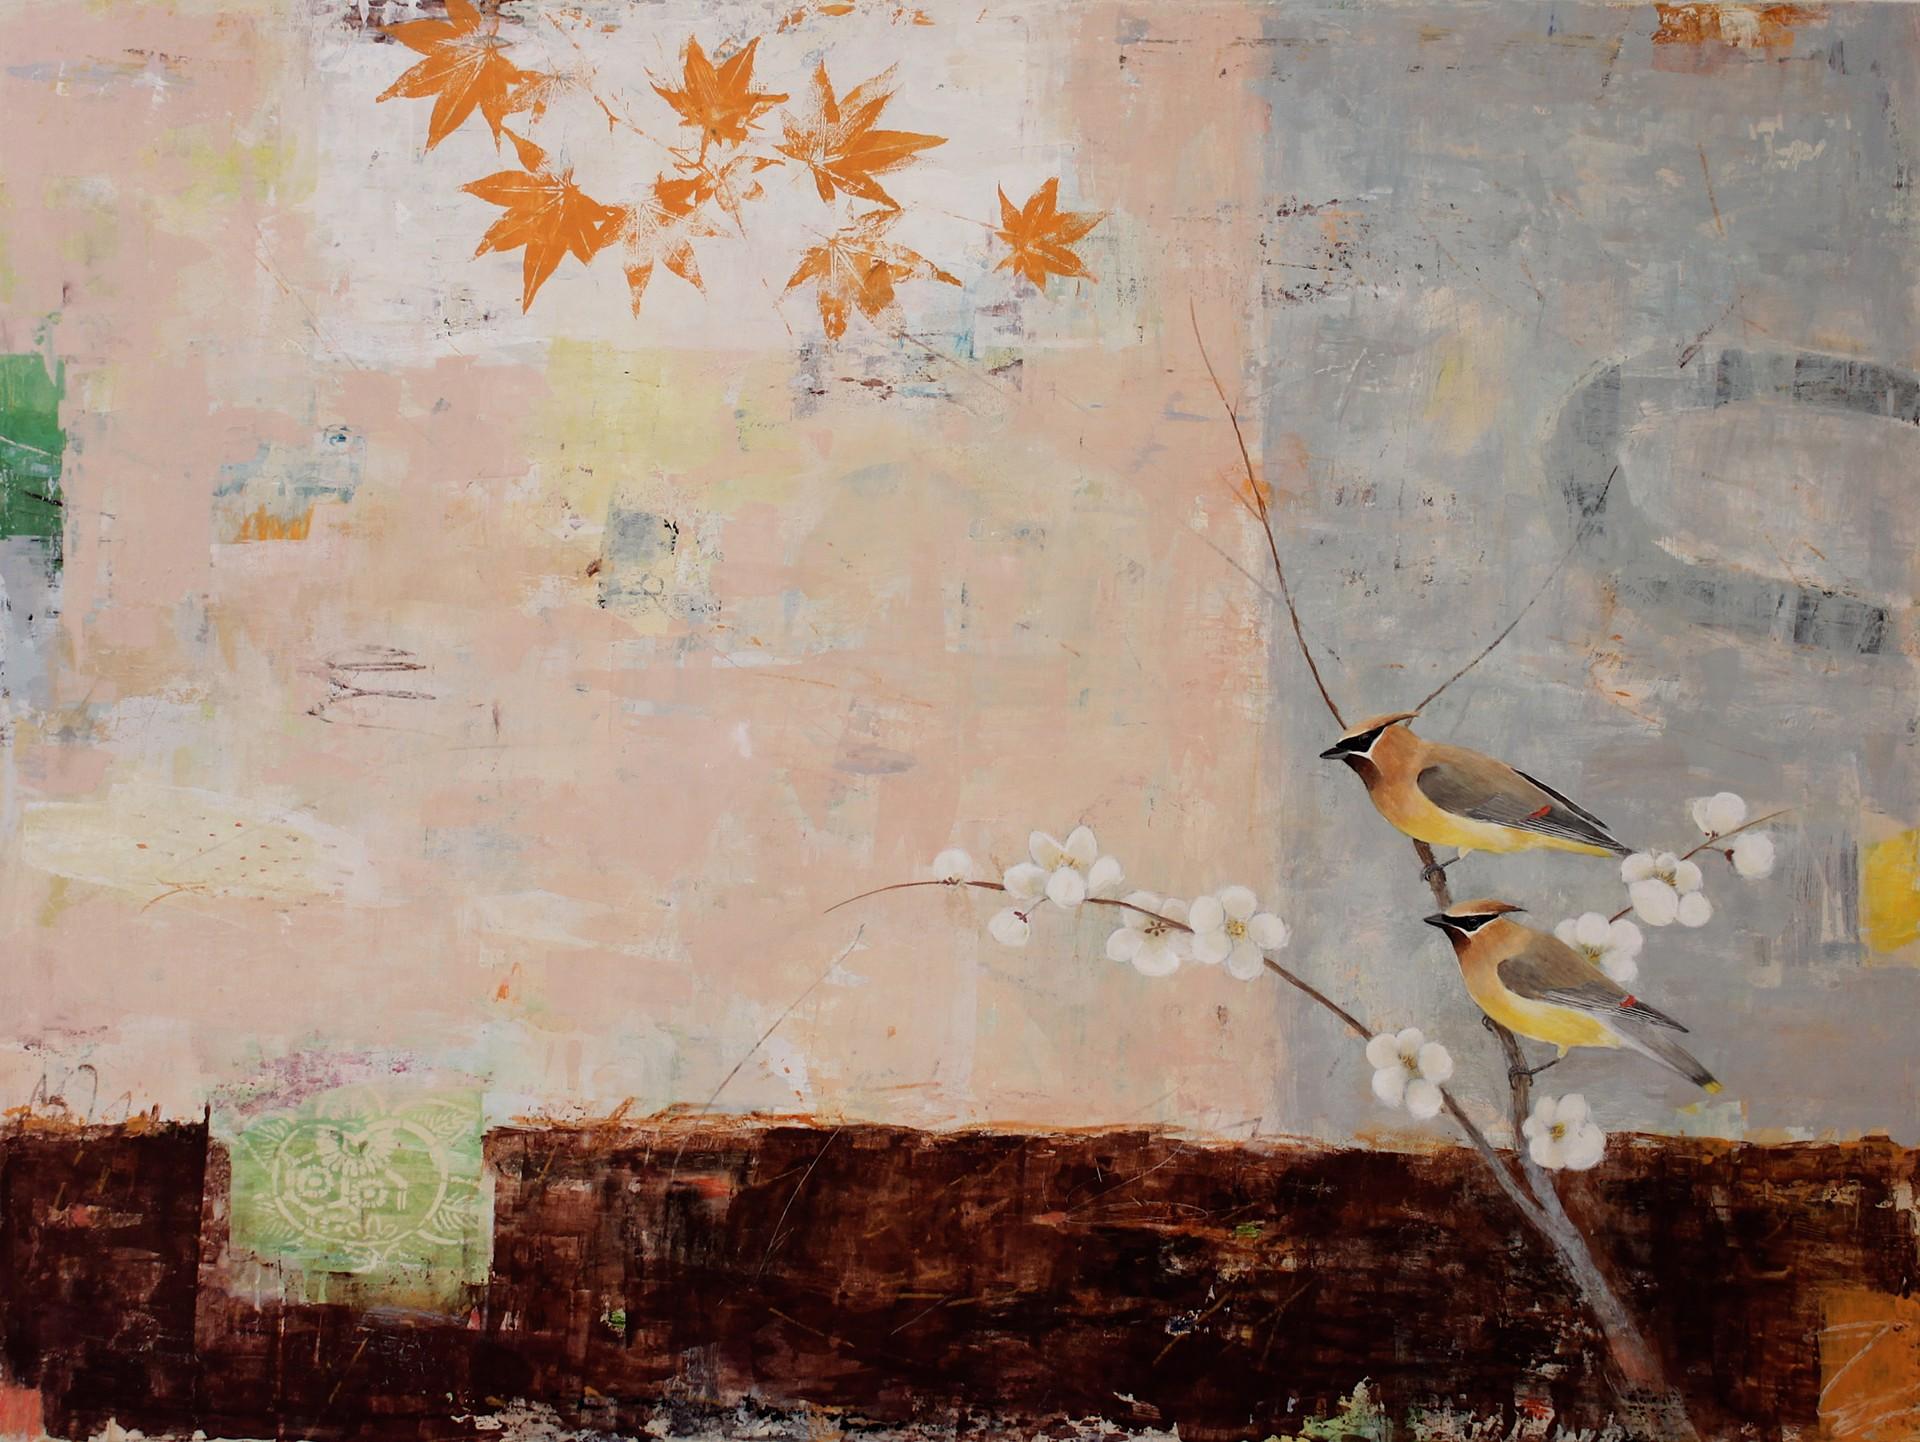 Transitory Horizon by Paul Brigham